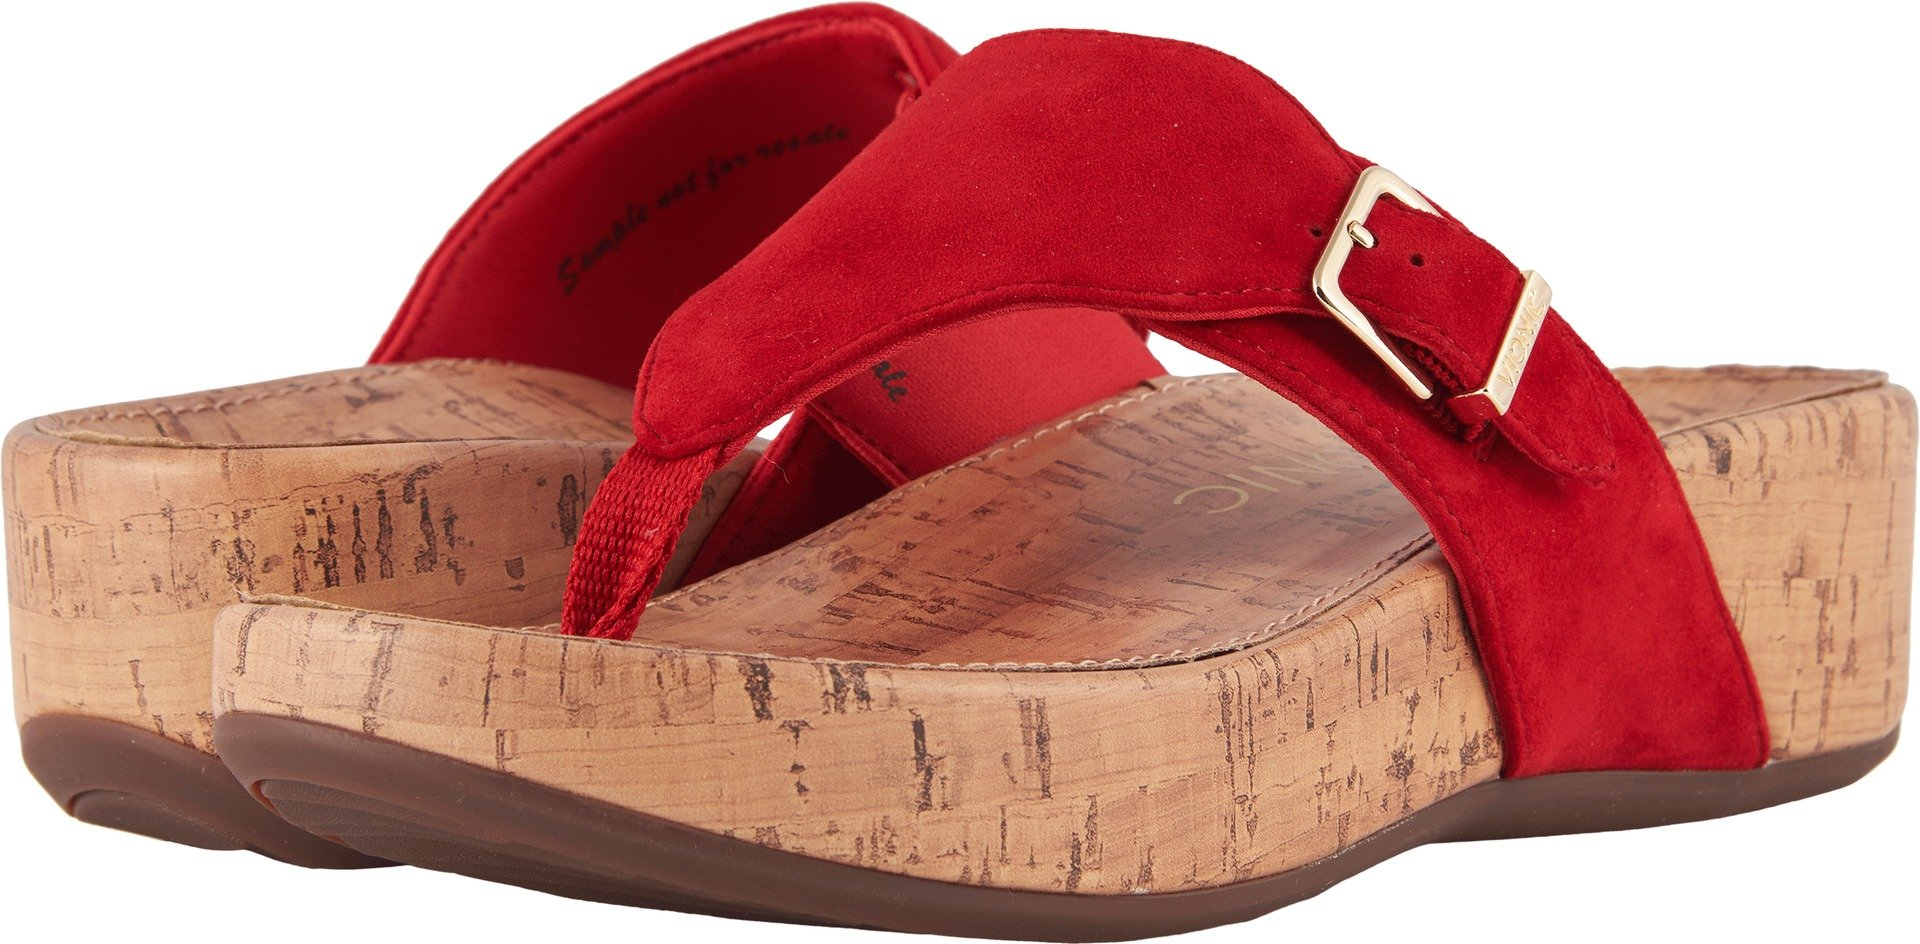 Vionic Womens Marbella Platform Sandal, Red, Size 10